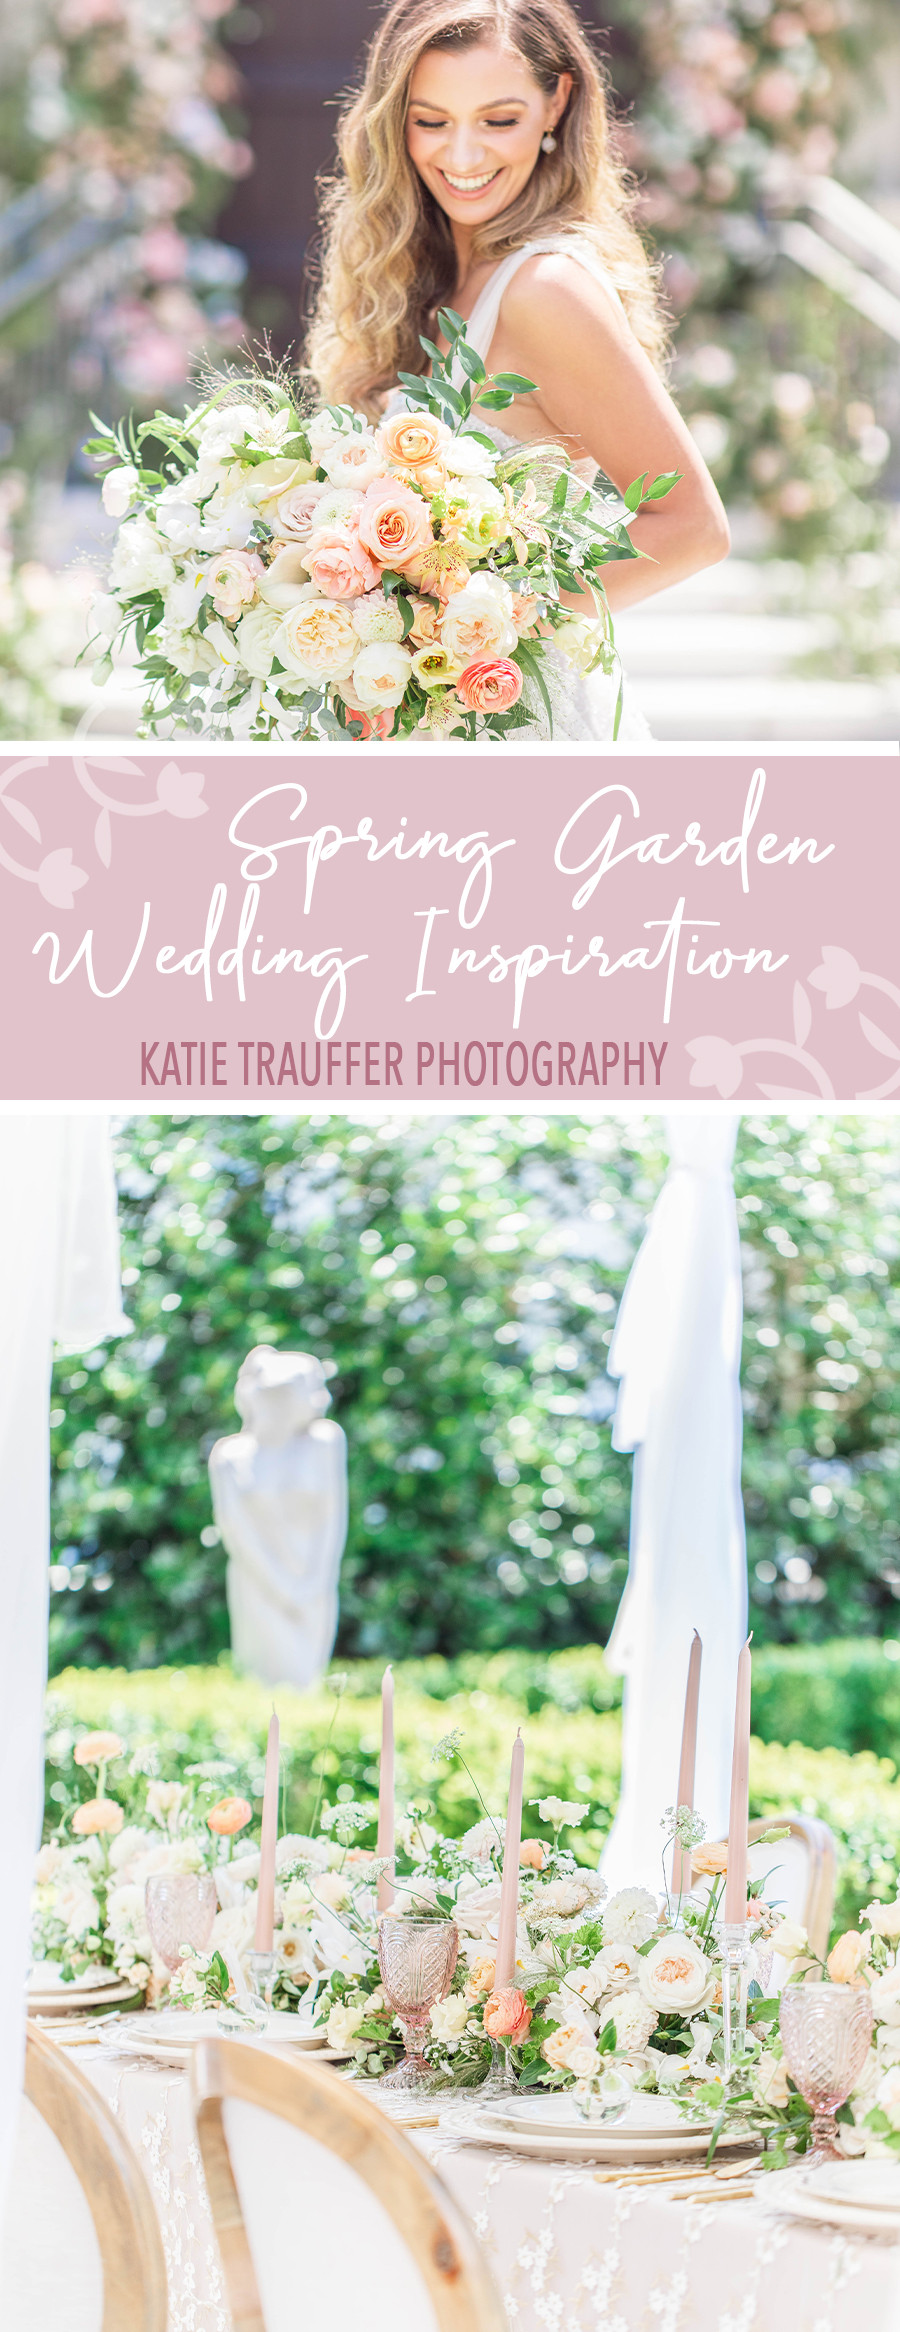 Spring Garden Wedding Inspiration by Katie Trauffer Photography